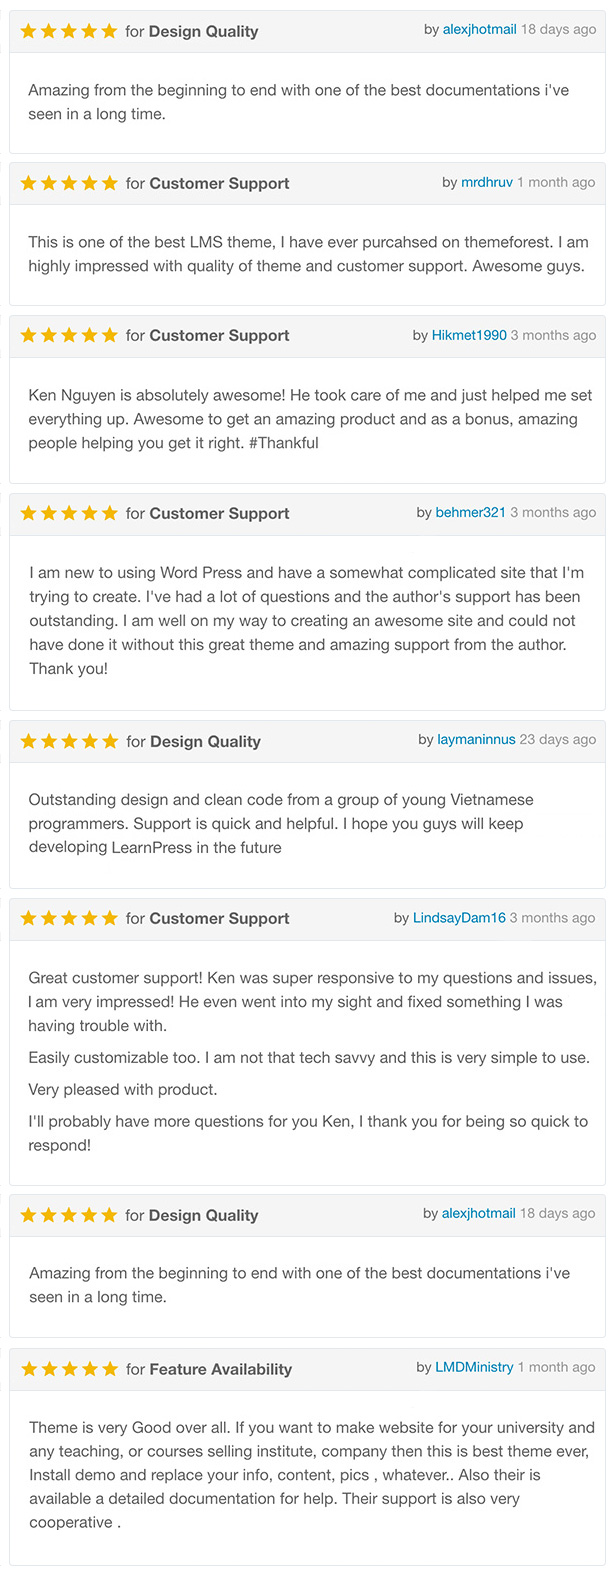 reviews - Course & LMS WordPress Theme | CBKit